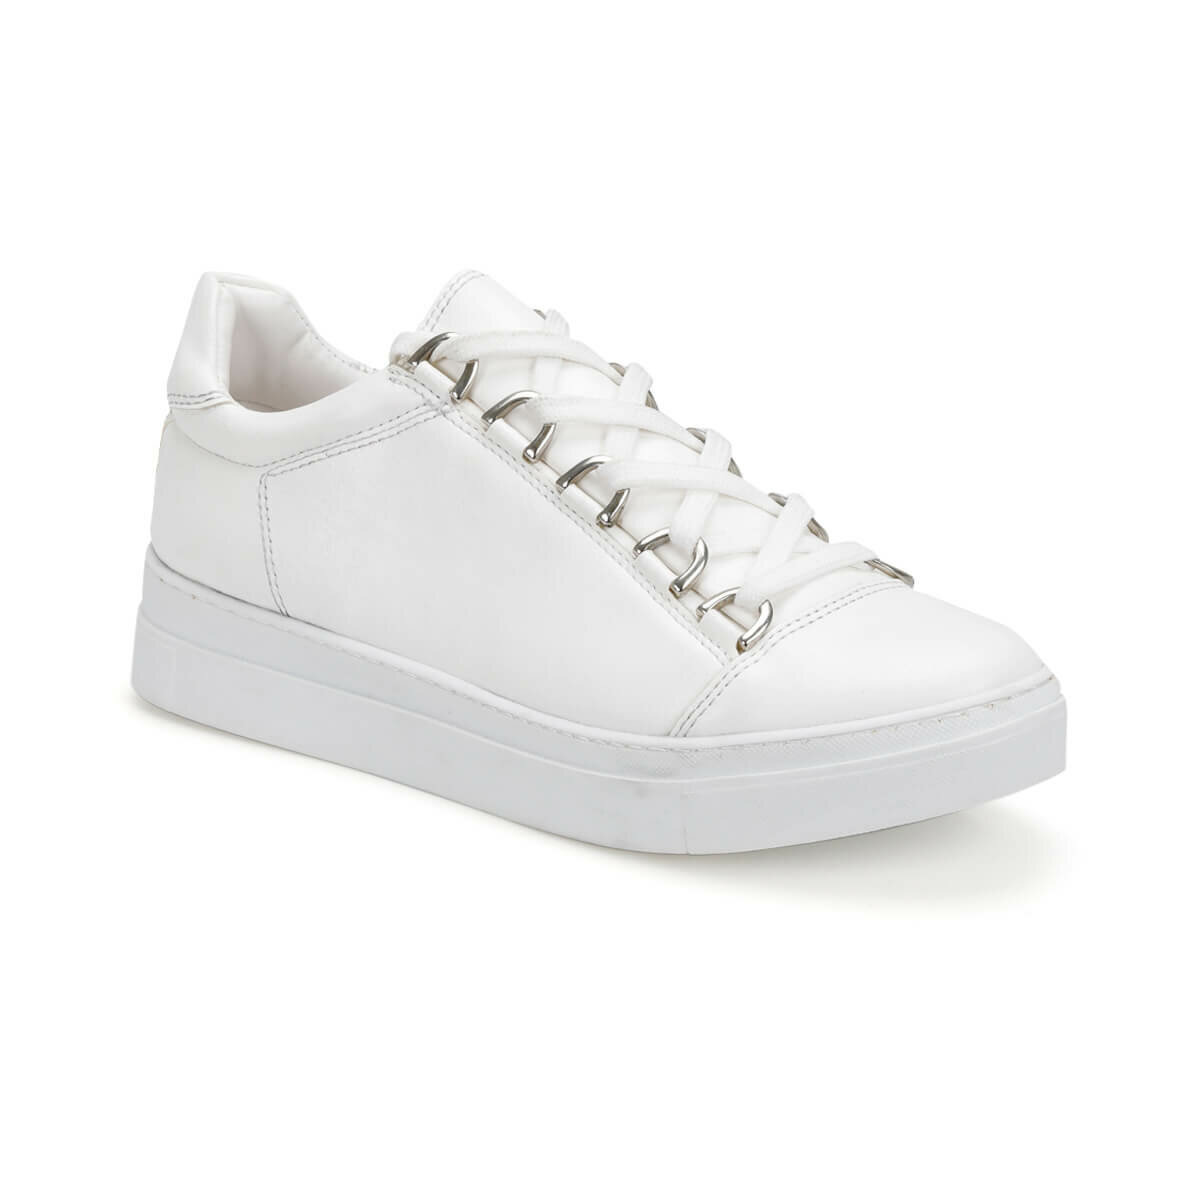 FLO CS18087-19S White Women 'S Sneaker Shoes Art Bella